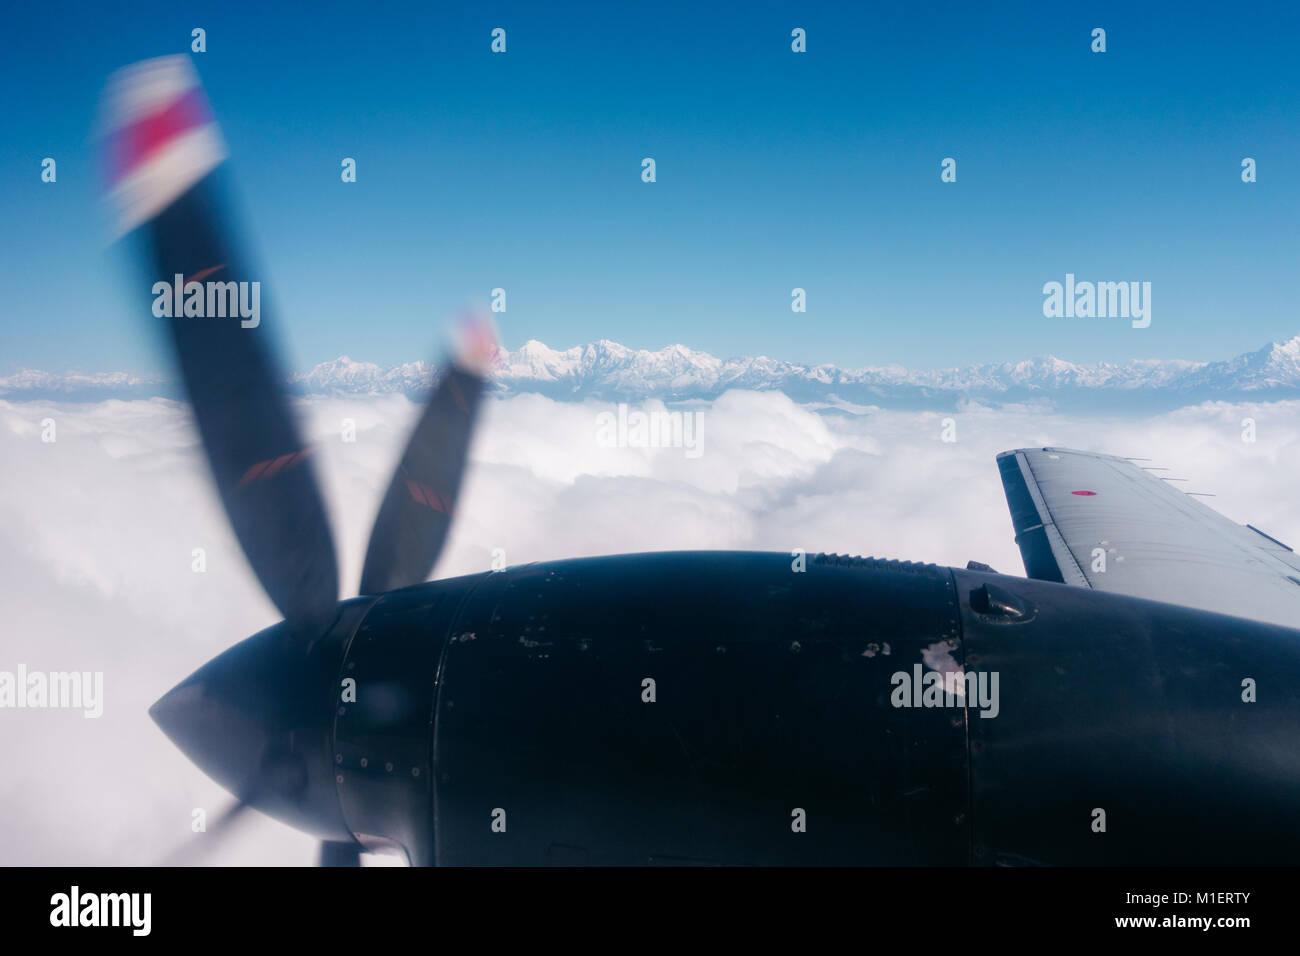 The Himalayas from a propeller plane, Nepal. Flight Kathmandu to Pokhara. - Stock Image